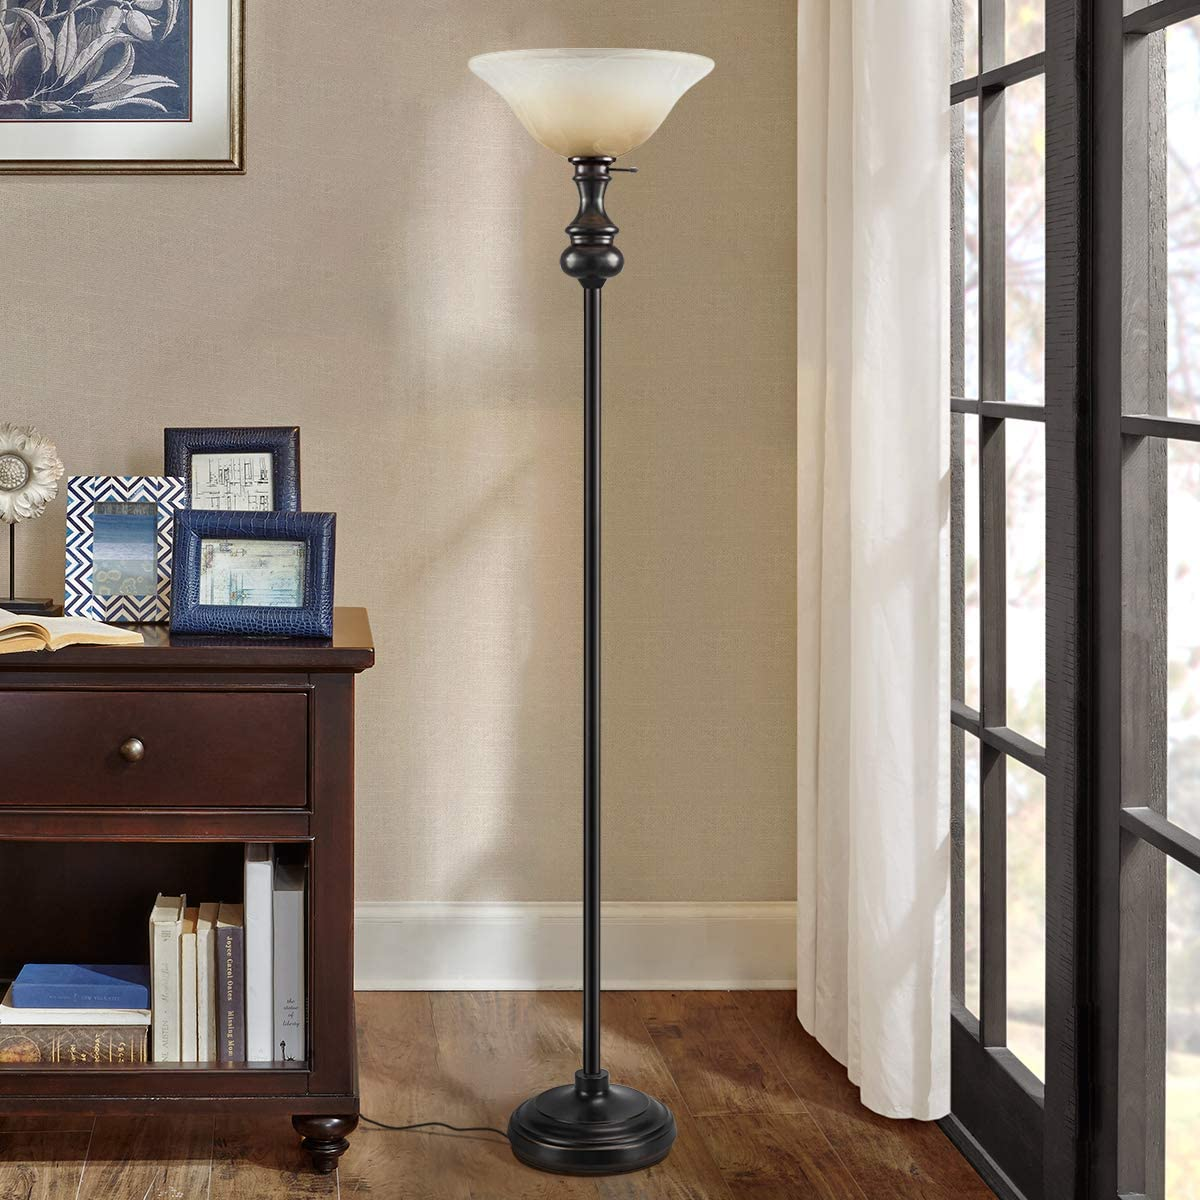 Modern-Shirley-Torchiere-Floor-Lamp-1 15 Unique Artistic Floor Lamps to Light Your Bedroom